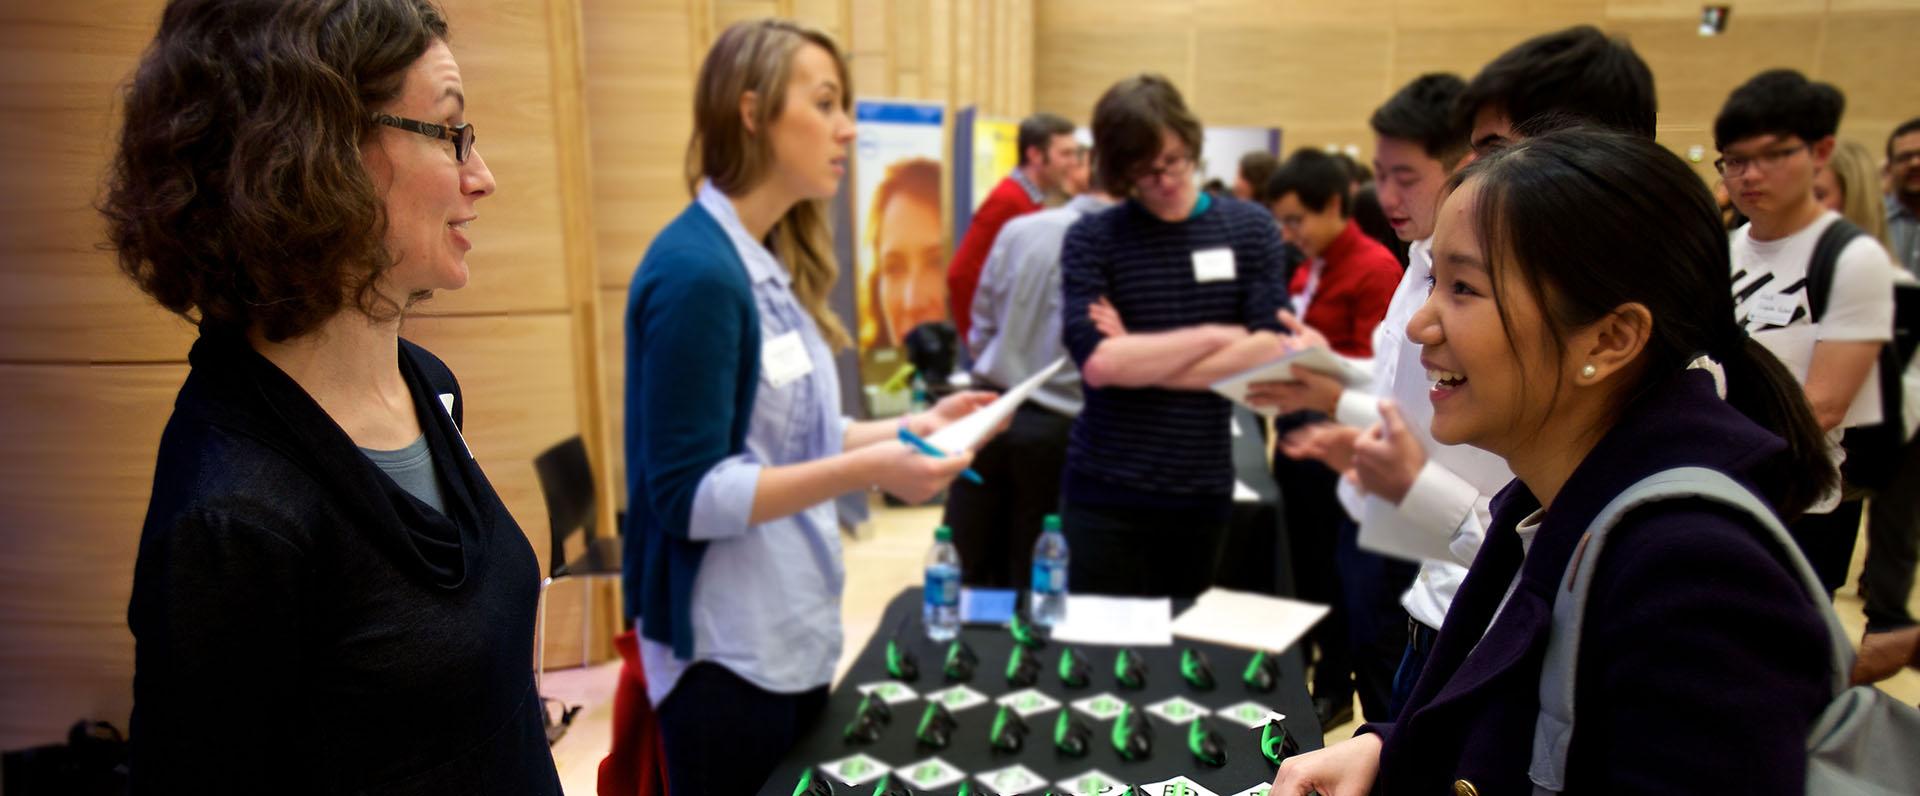 Human Centered Design And Engineering Career Fair Career